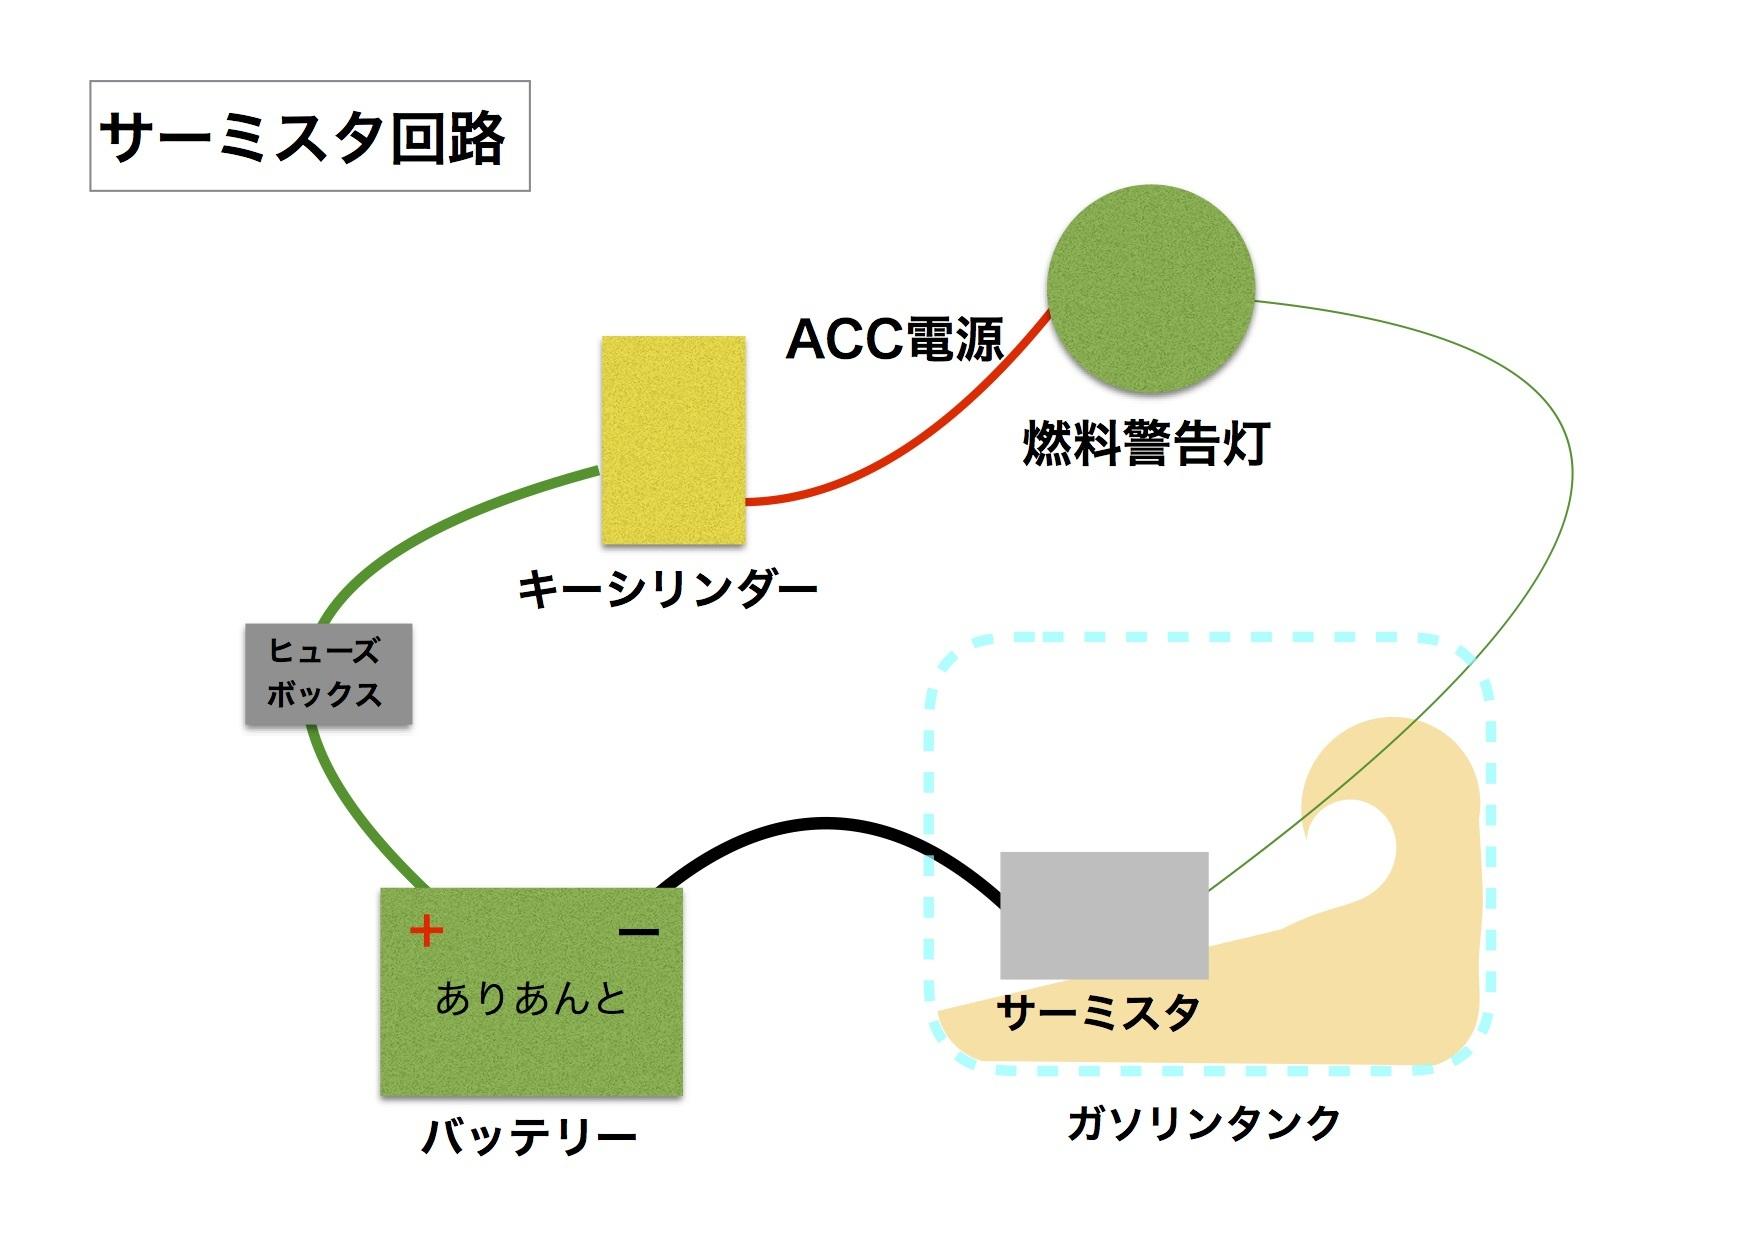 【DB7】サーミスタ回路 ACC電源がアレの件。原因はリレーか!?_e0159646_02250646.jpg